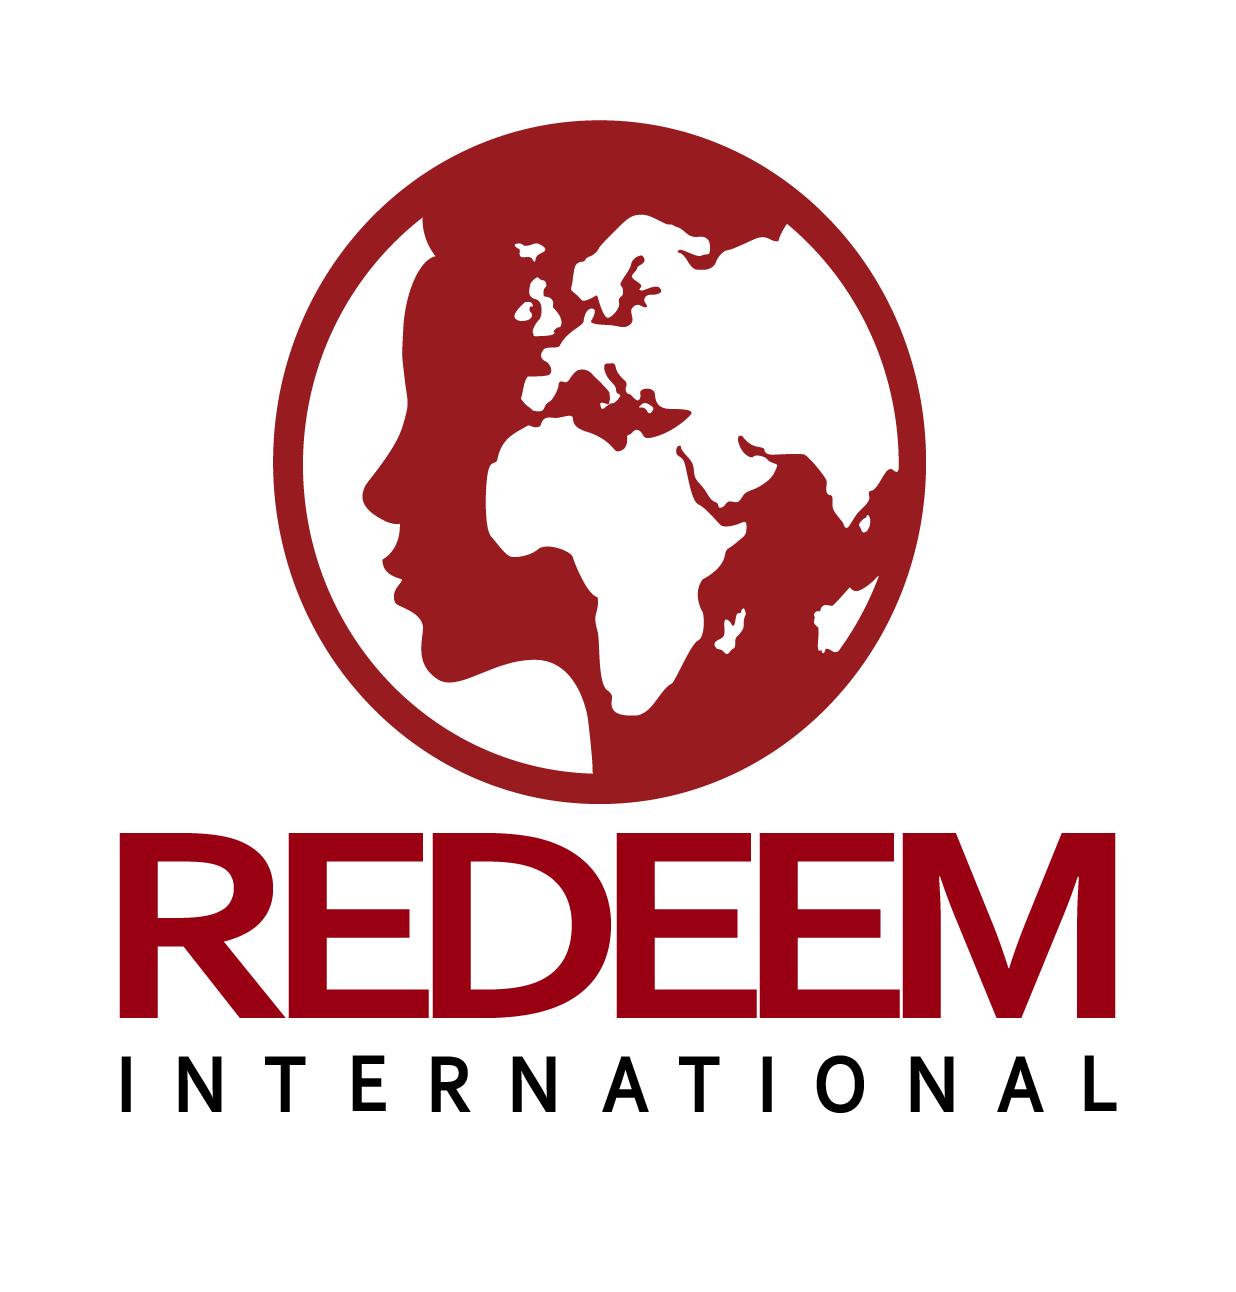 Redeem International